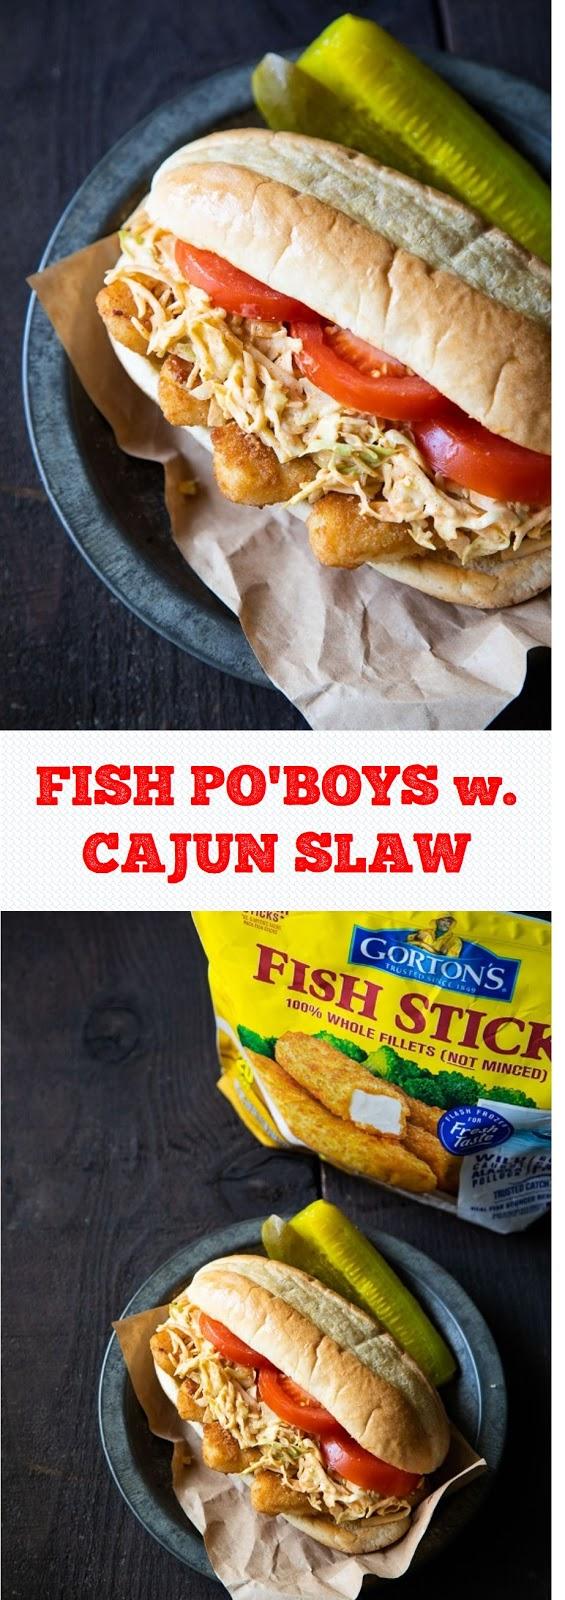 FISH PO'BOYS w. CAJUN SLAW